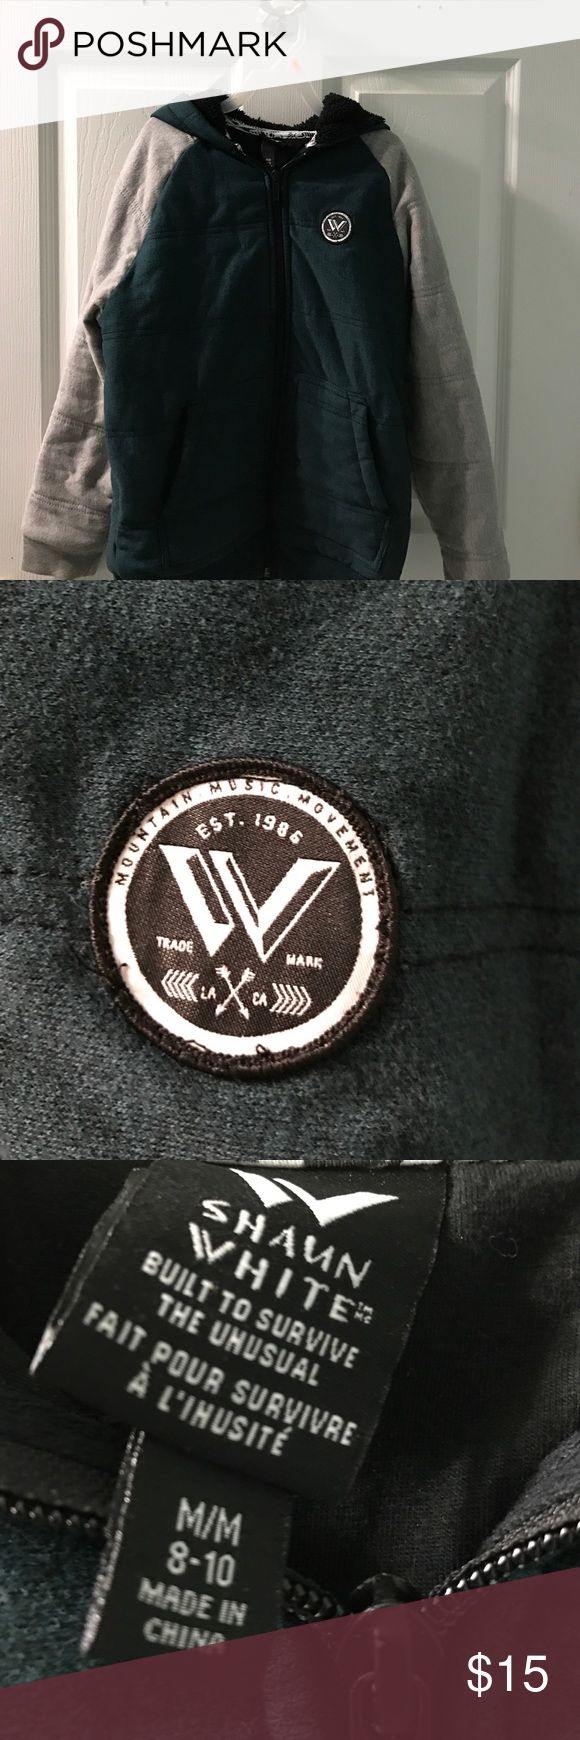 Boys gently worn Shaun white zip up hoodie Boys gently worn Shaun white zip up hoodie shaun white Jackets & Coats